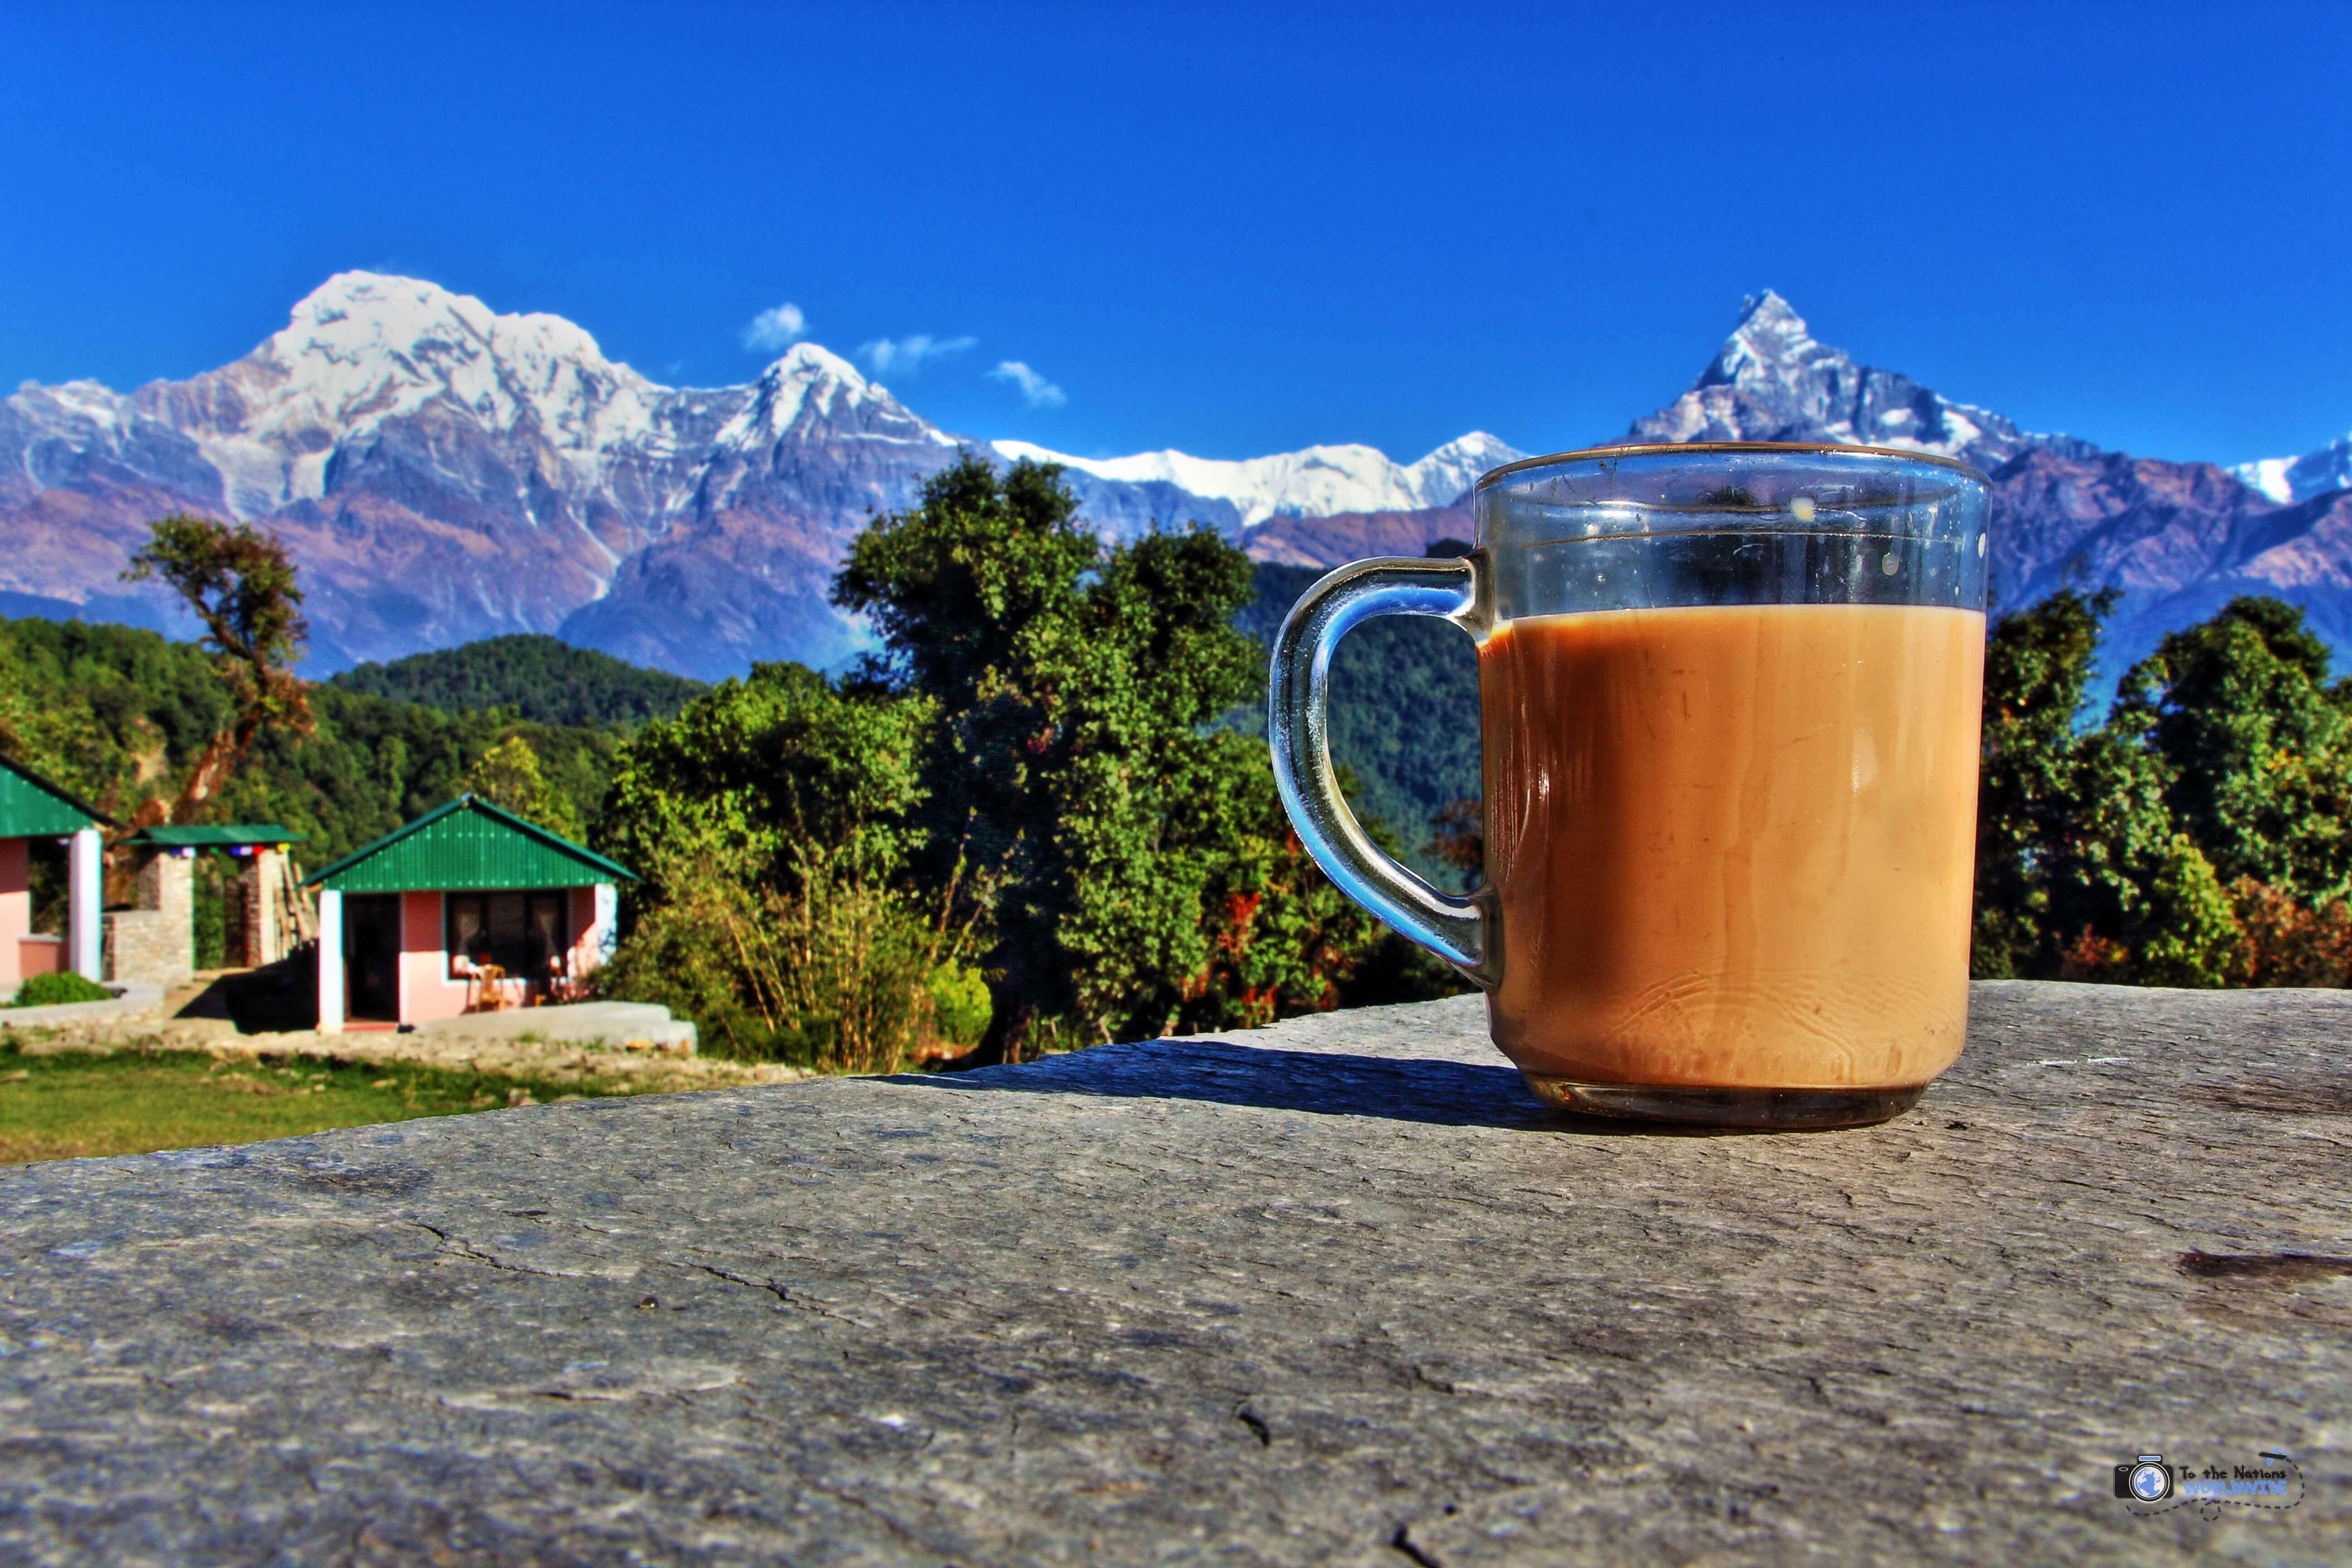 Travel Photo The Annapurna Mountain Range with Nepalese Tea